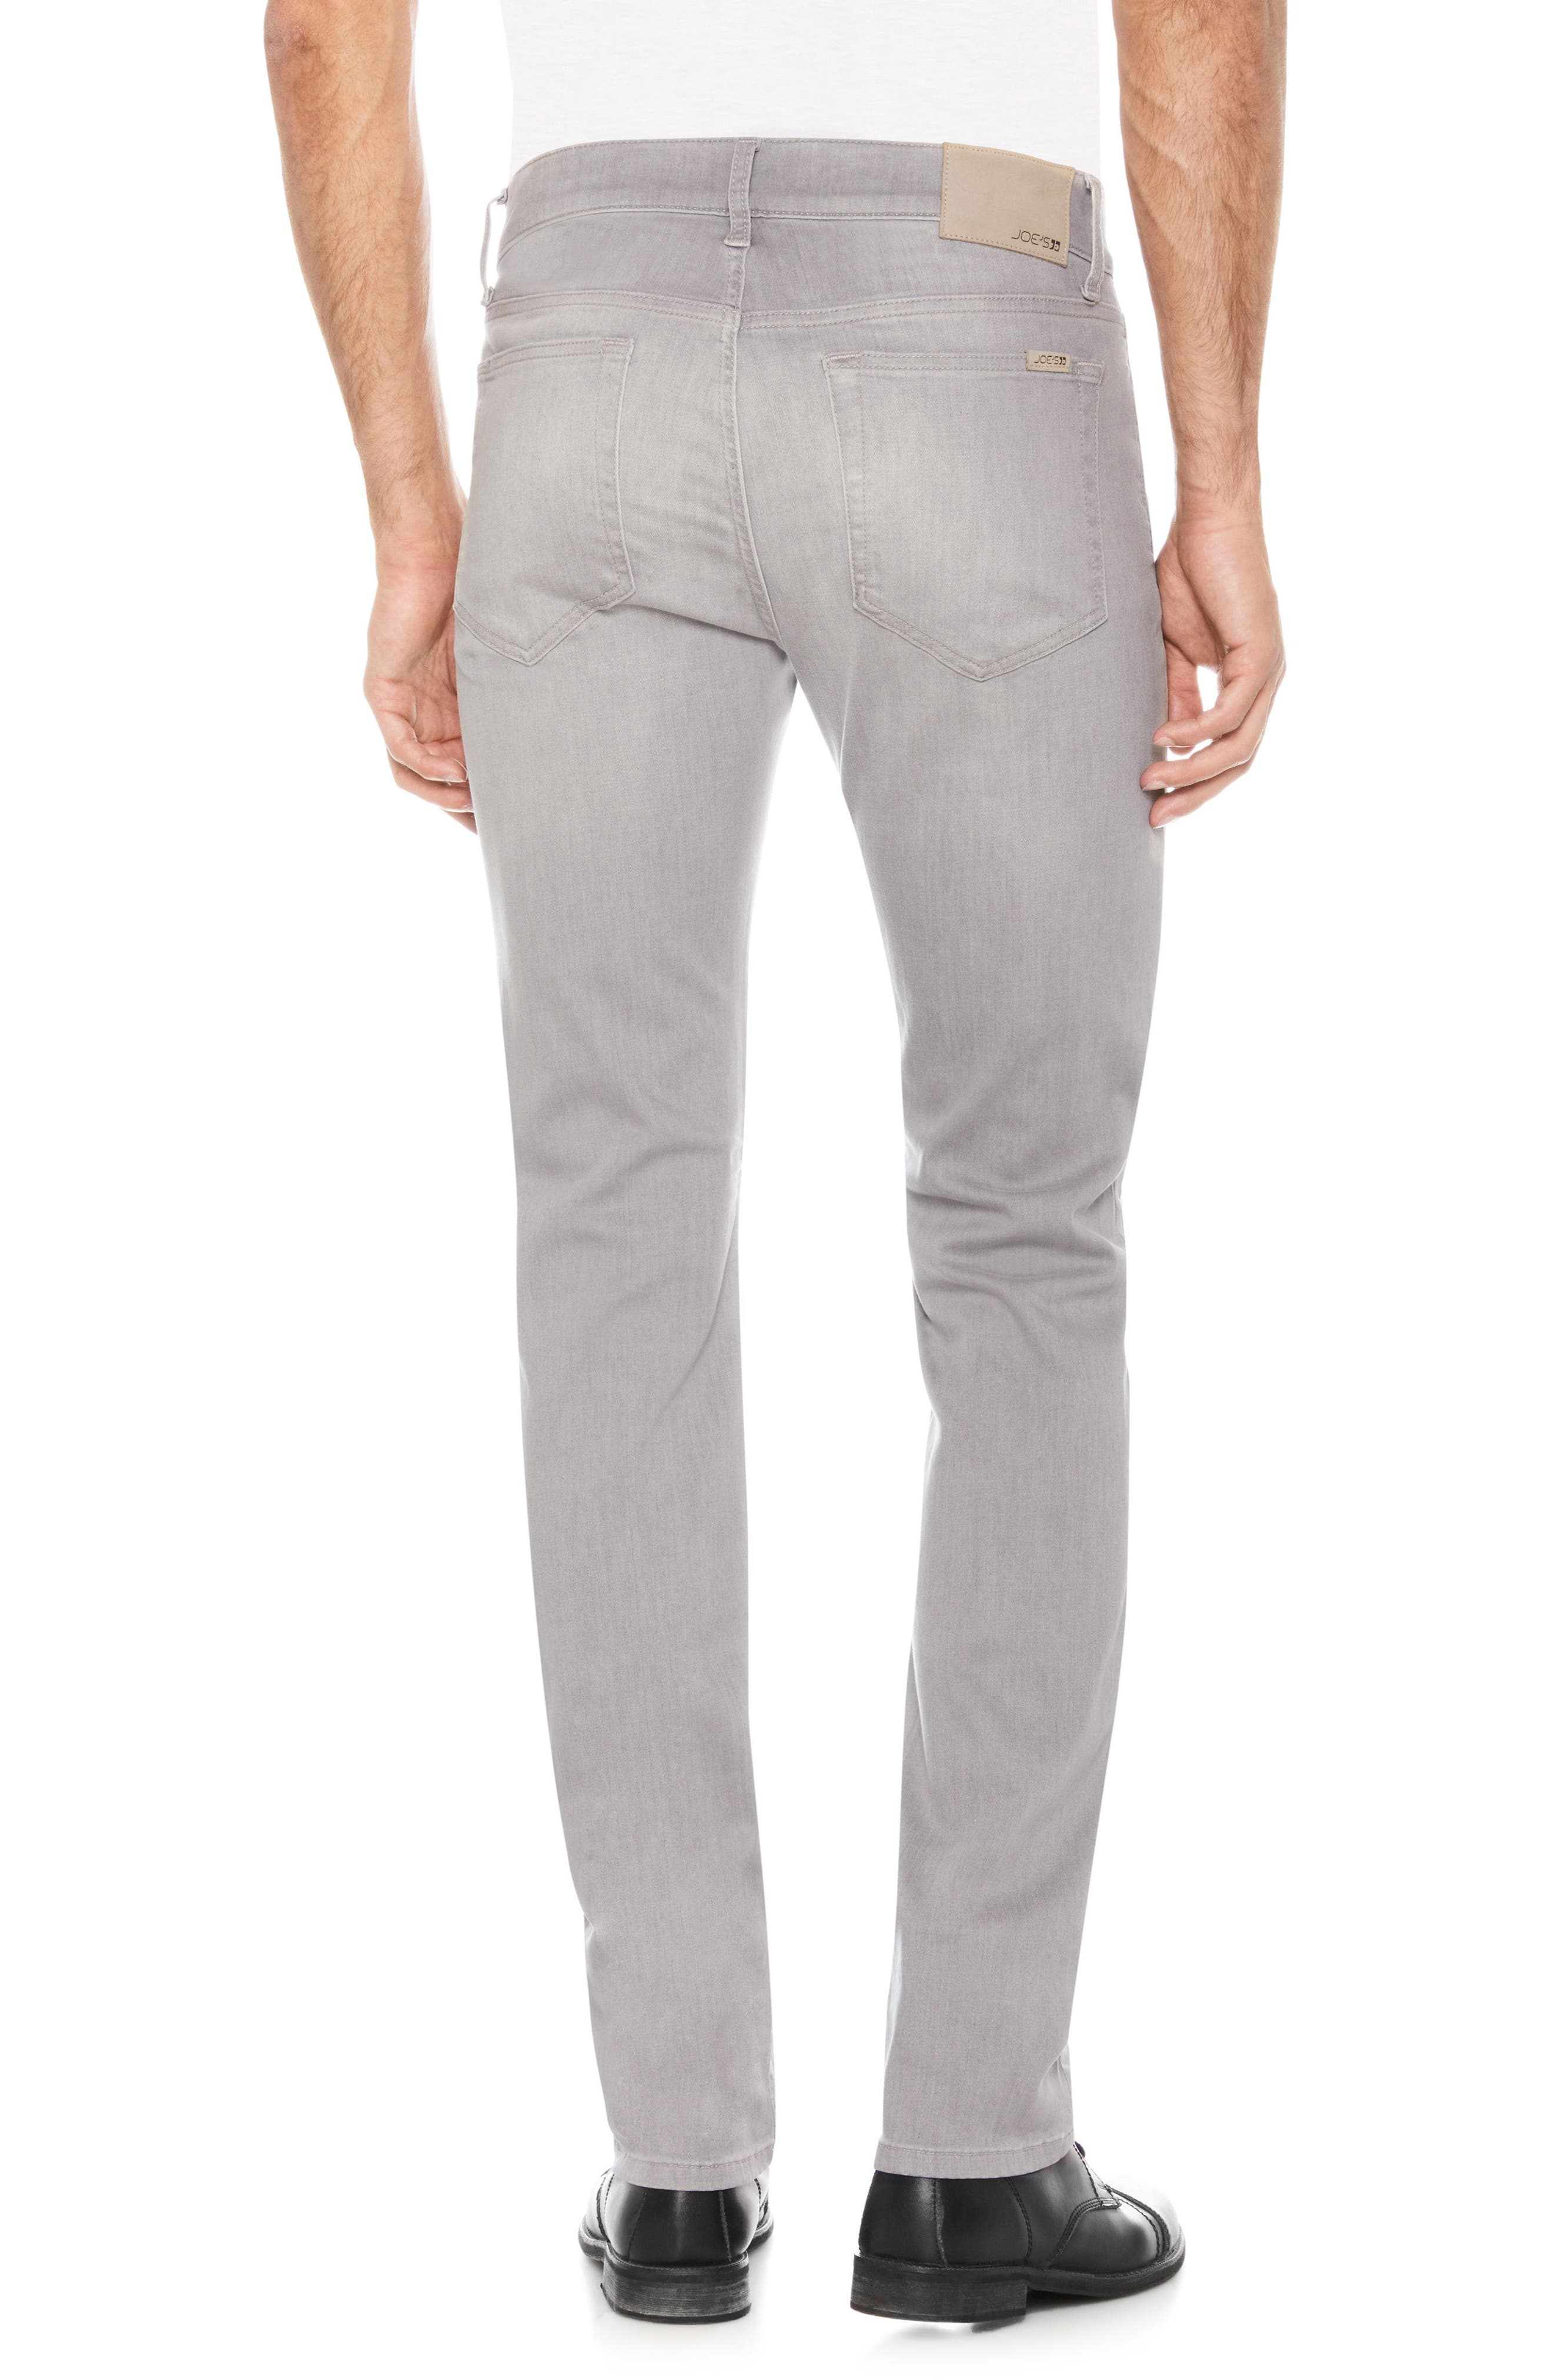 Brixton Slim Straight Fit Jeans,                             Alternate thumbnail 2, color,                             050